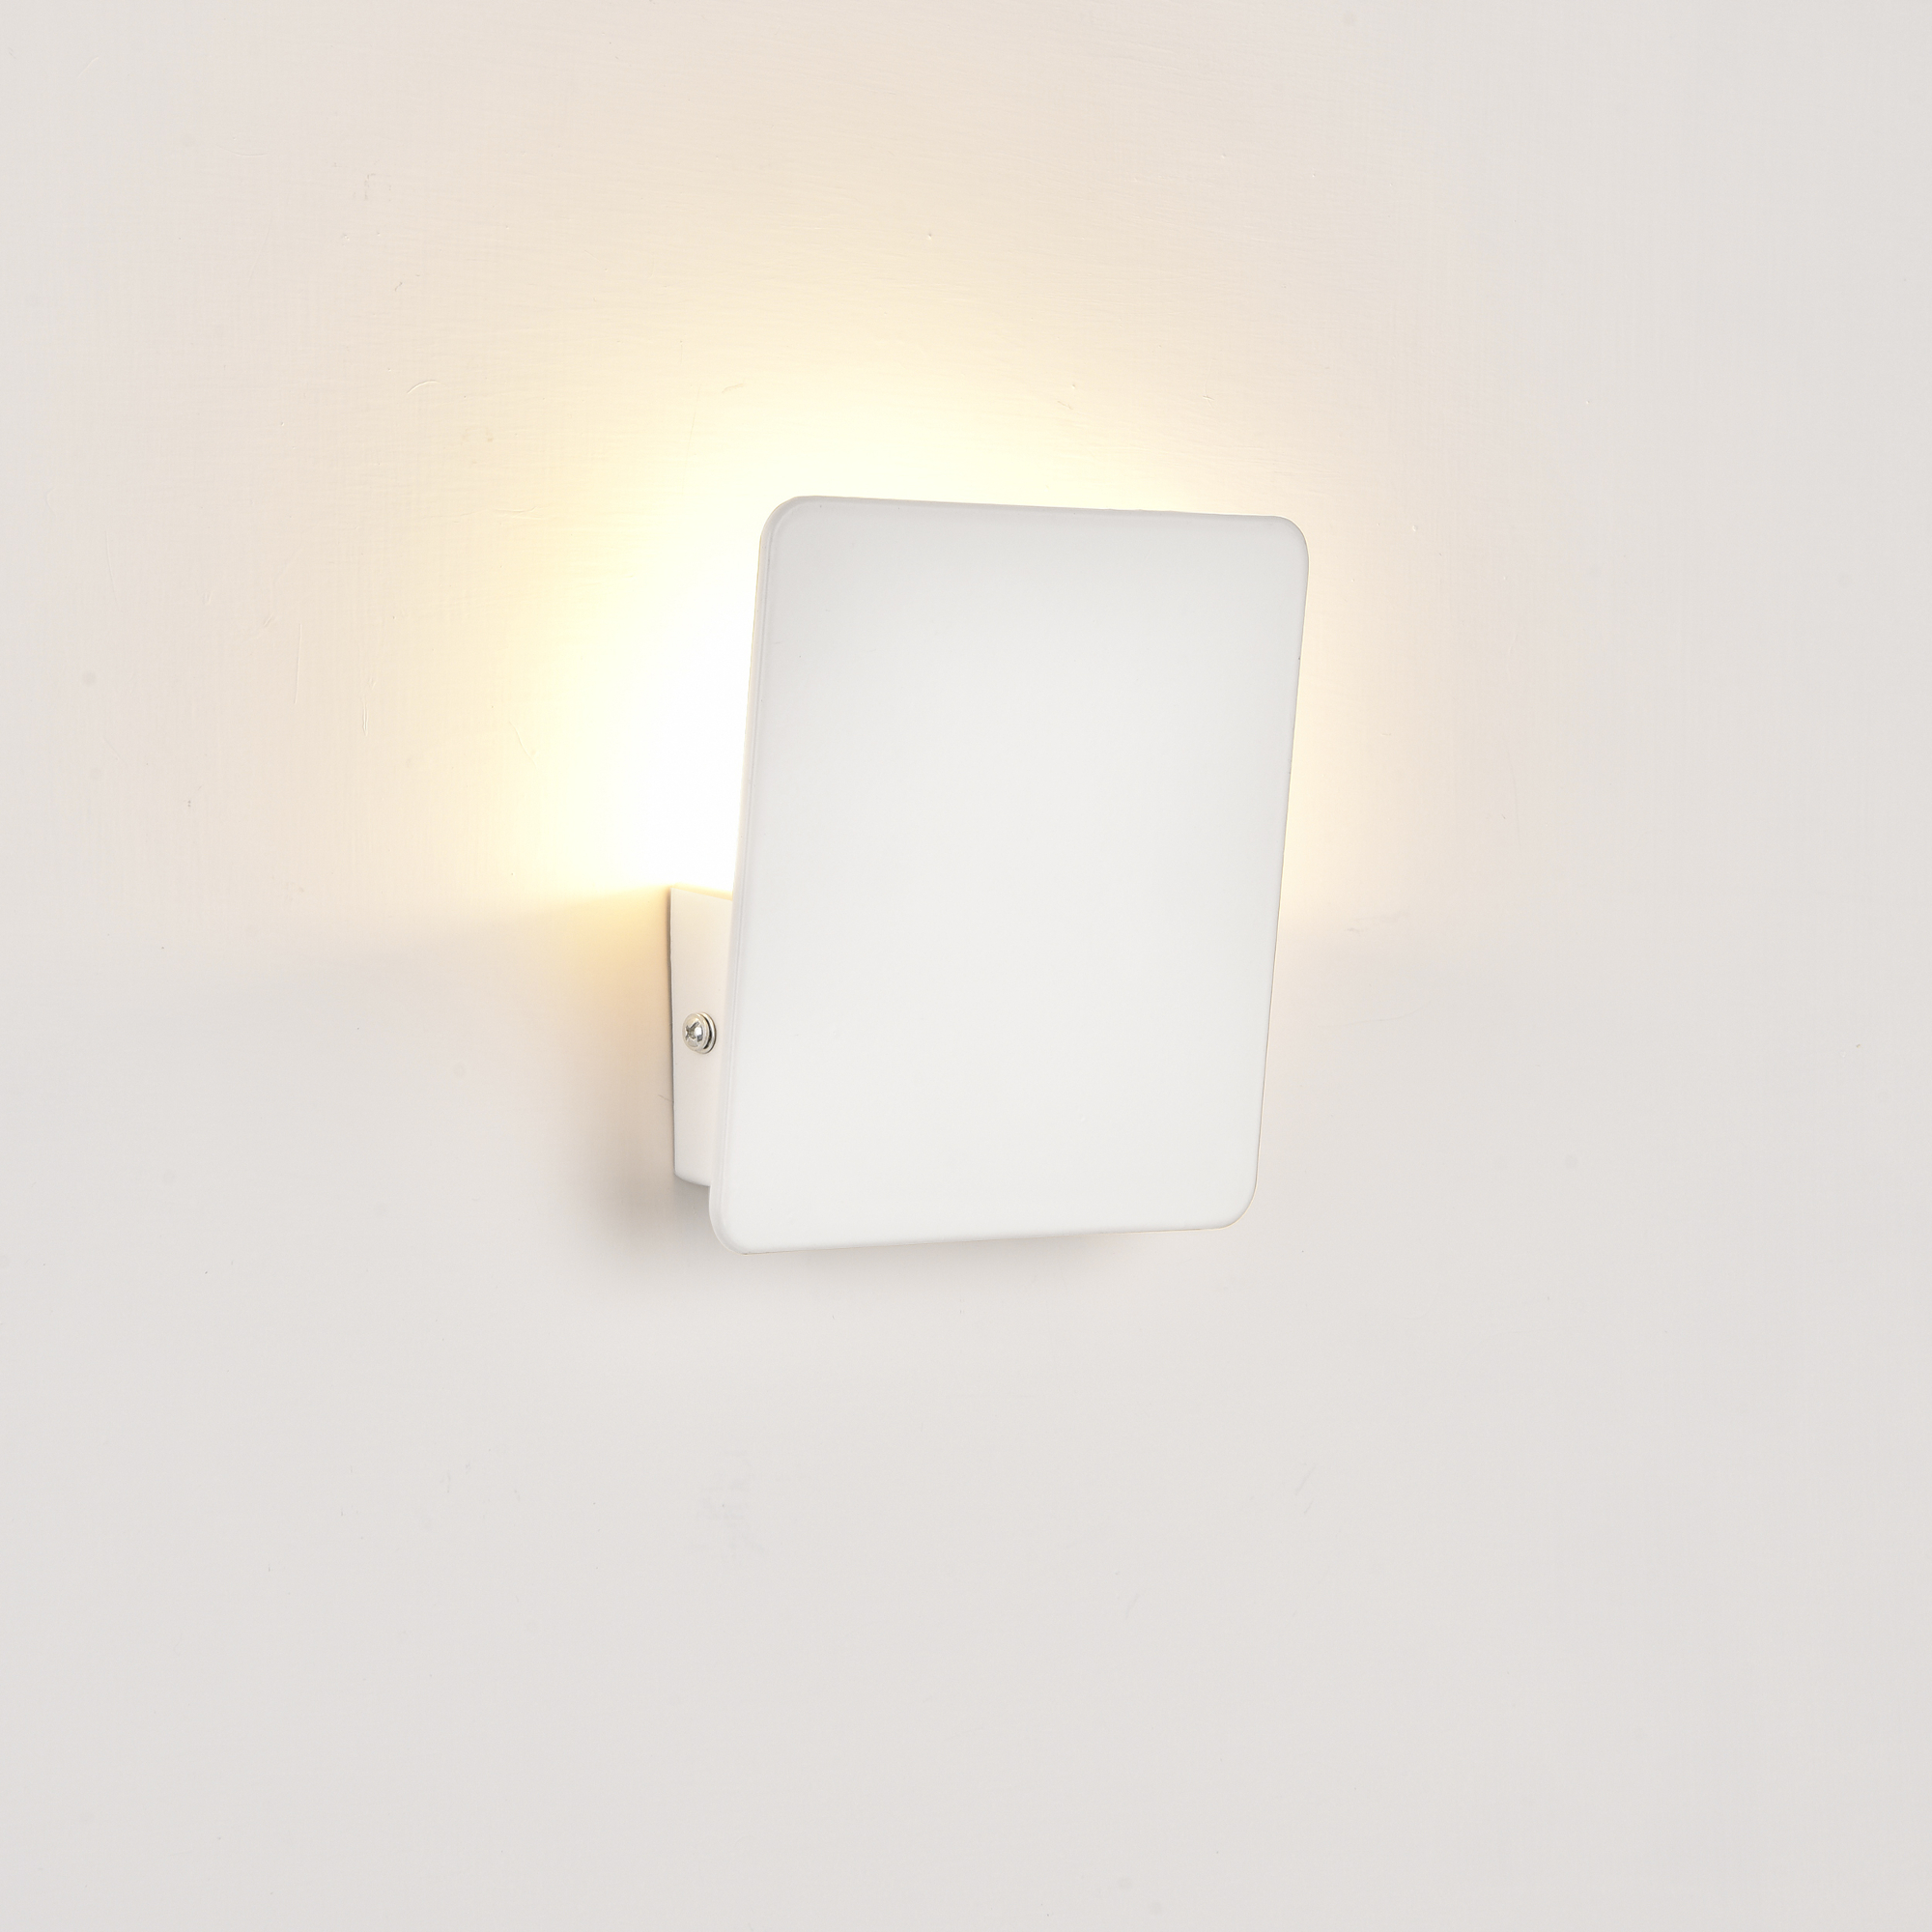 wandleuchte wandlampe beleuchtung flurlampe. Black Bedroom Furniture Sets. Home Design Ideas